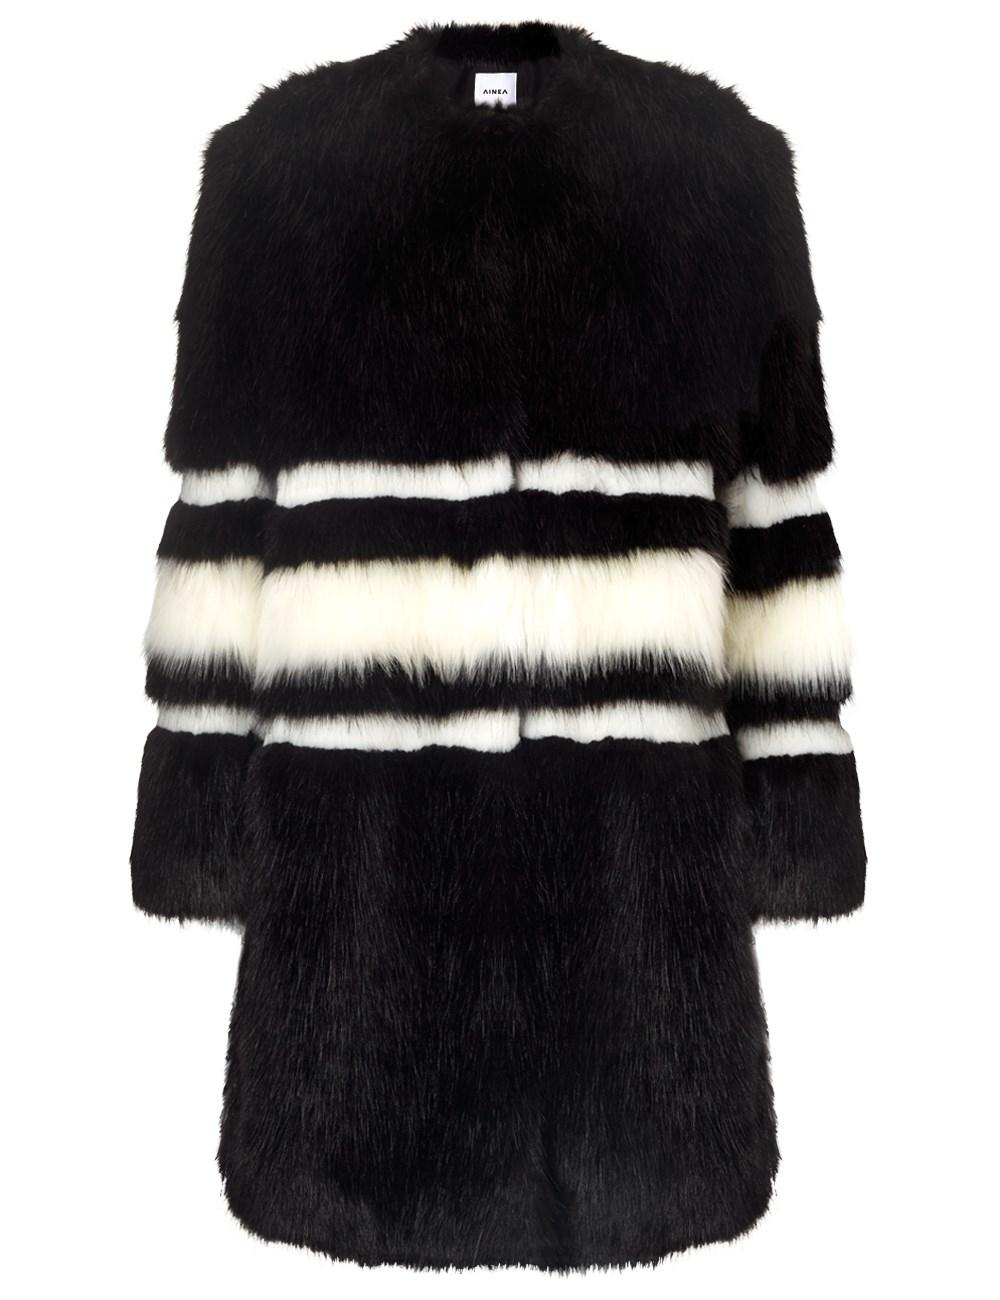 Ainea Black And White Faux Fur Coat Lyst